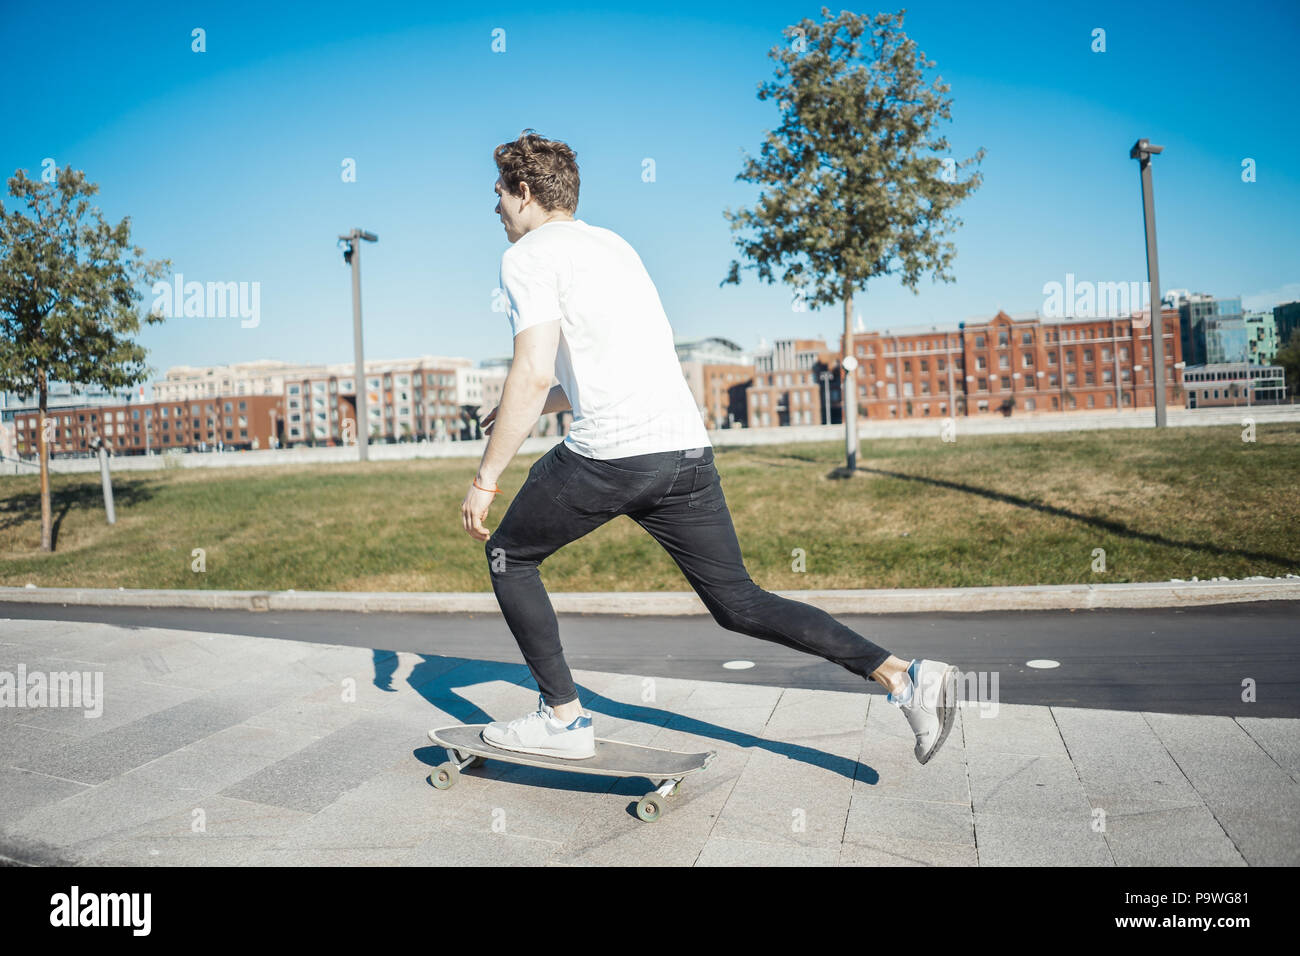 Jungen attraktiven Mann reiten Longboard im Park. Stockbild